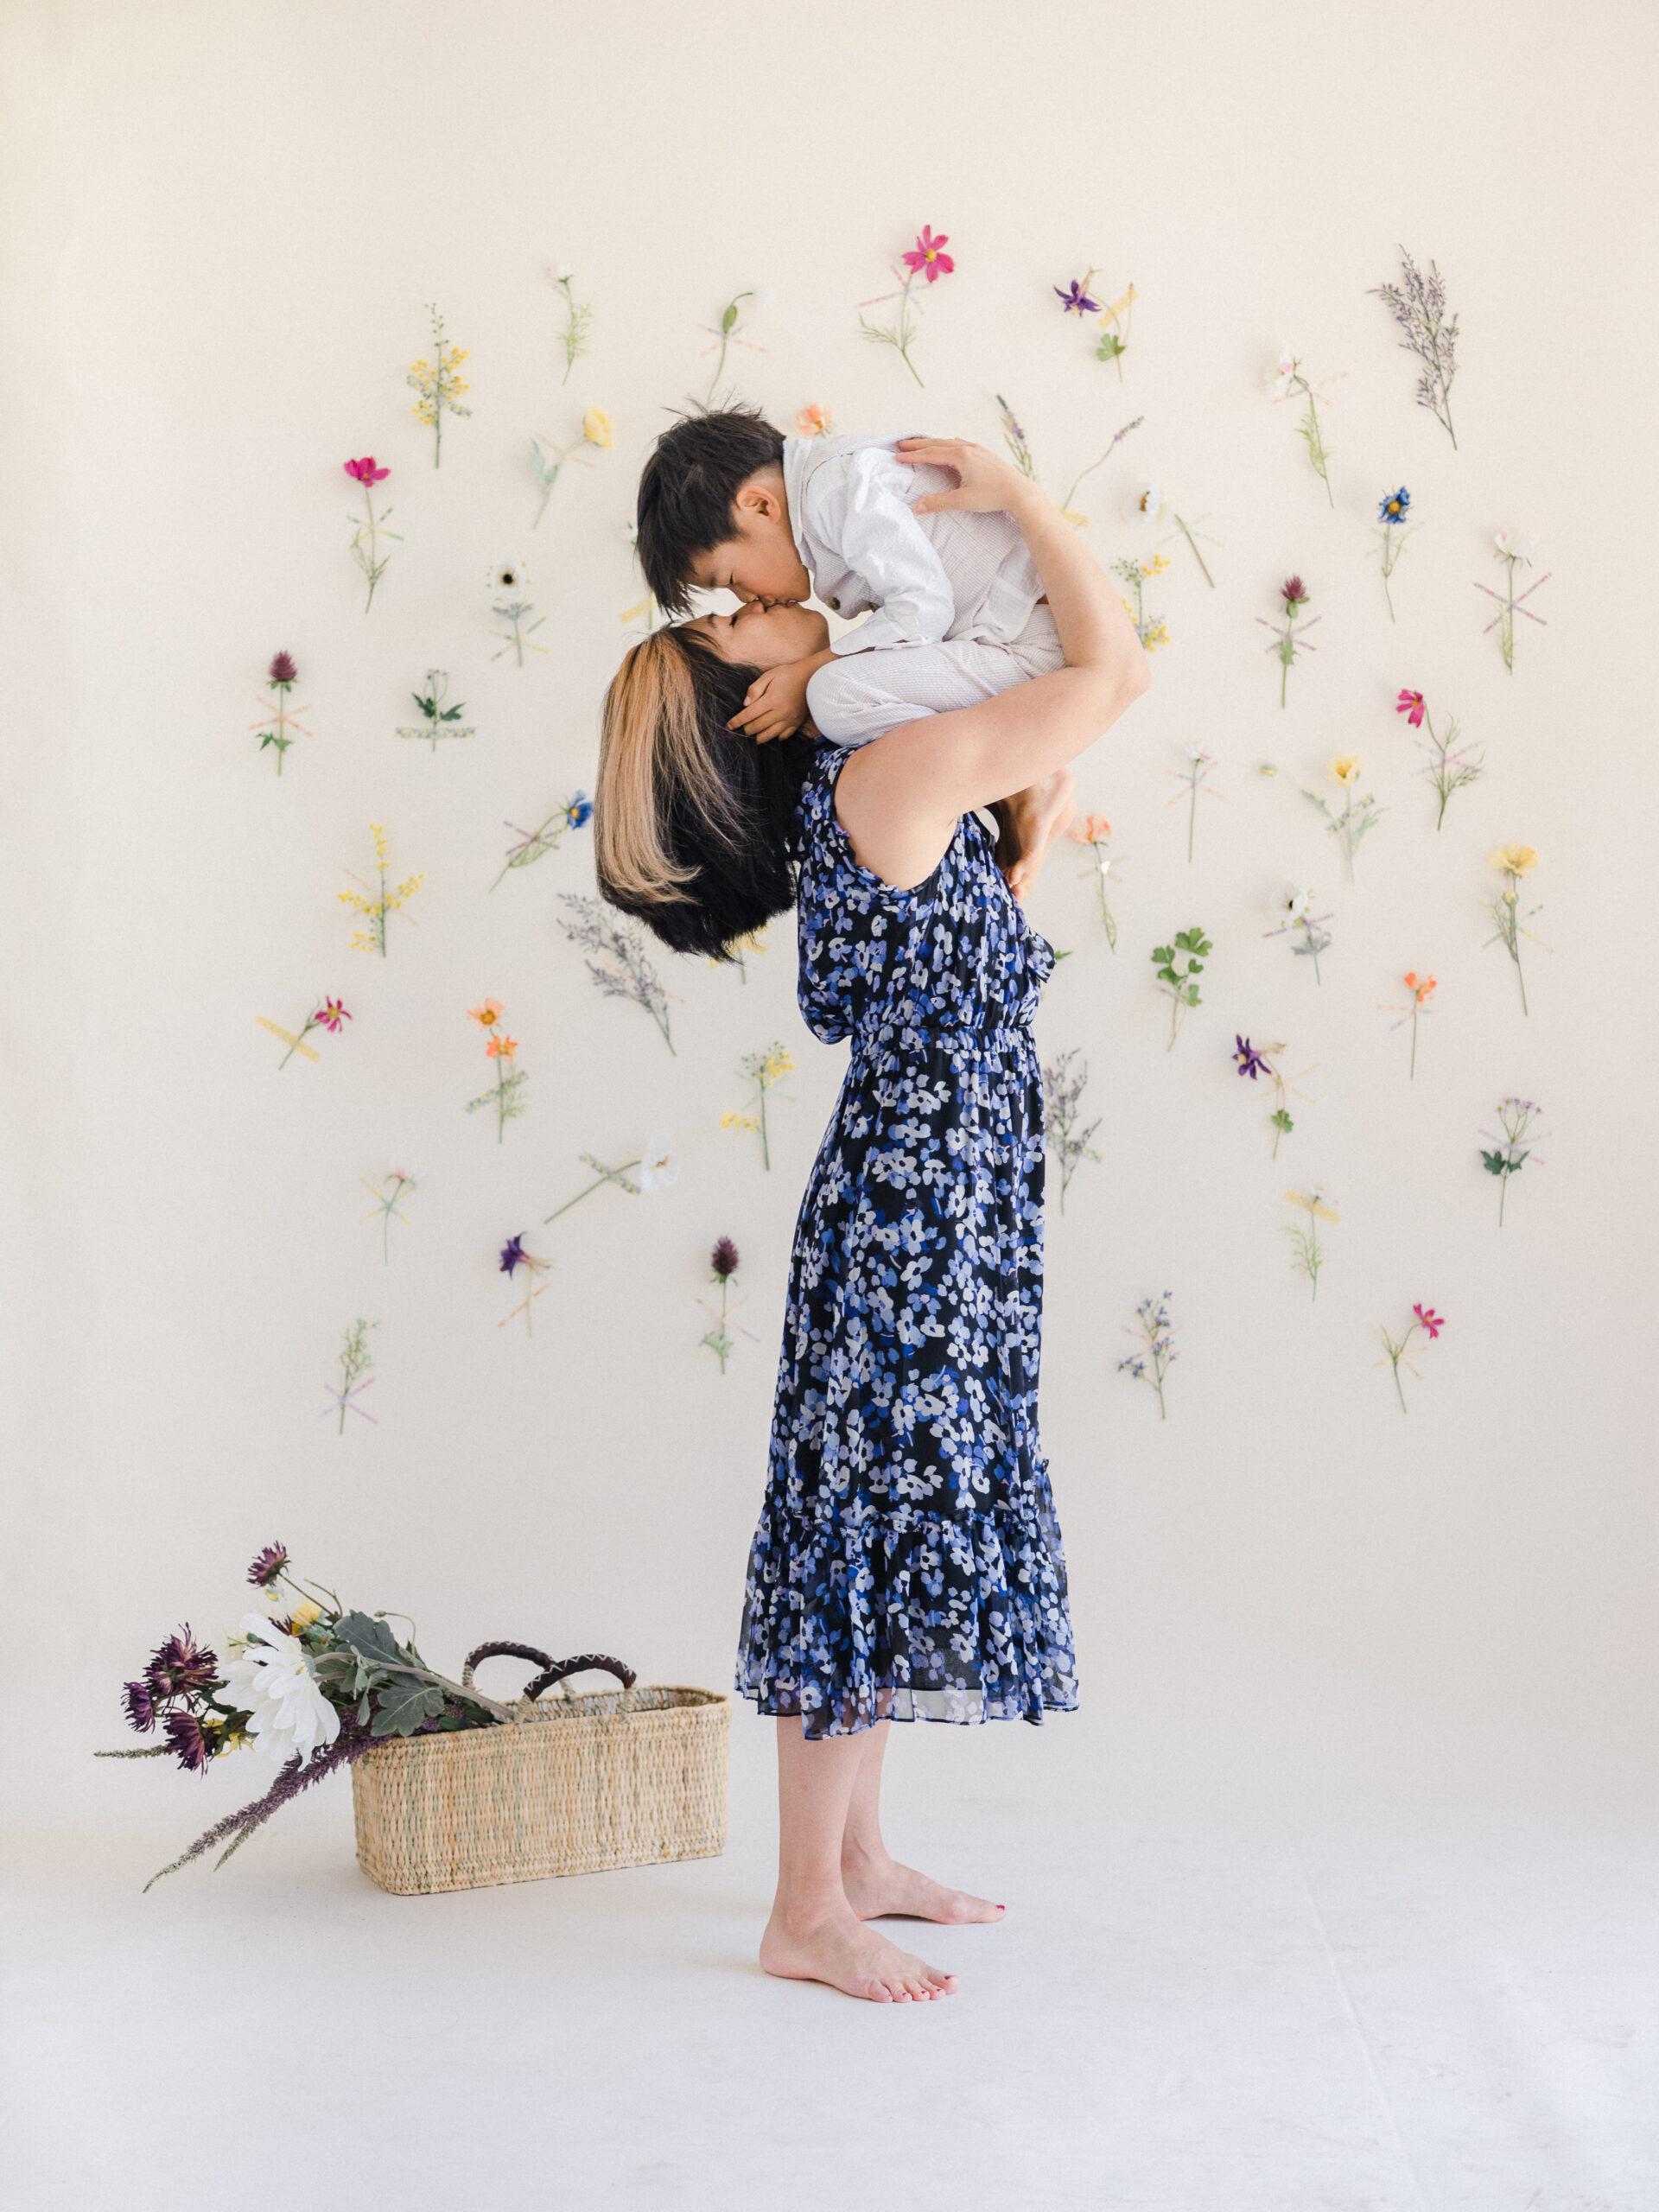 Why Celebrating Motherhood Is Important